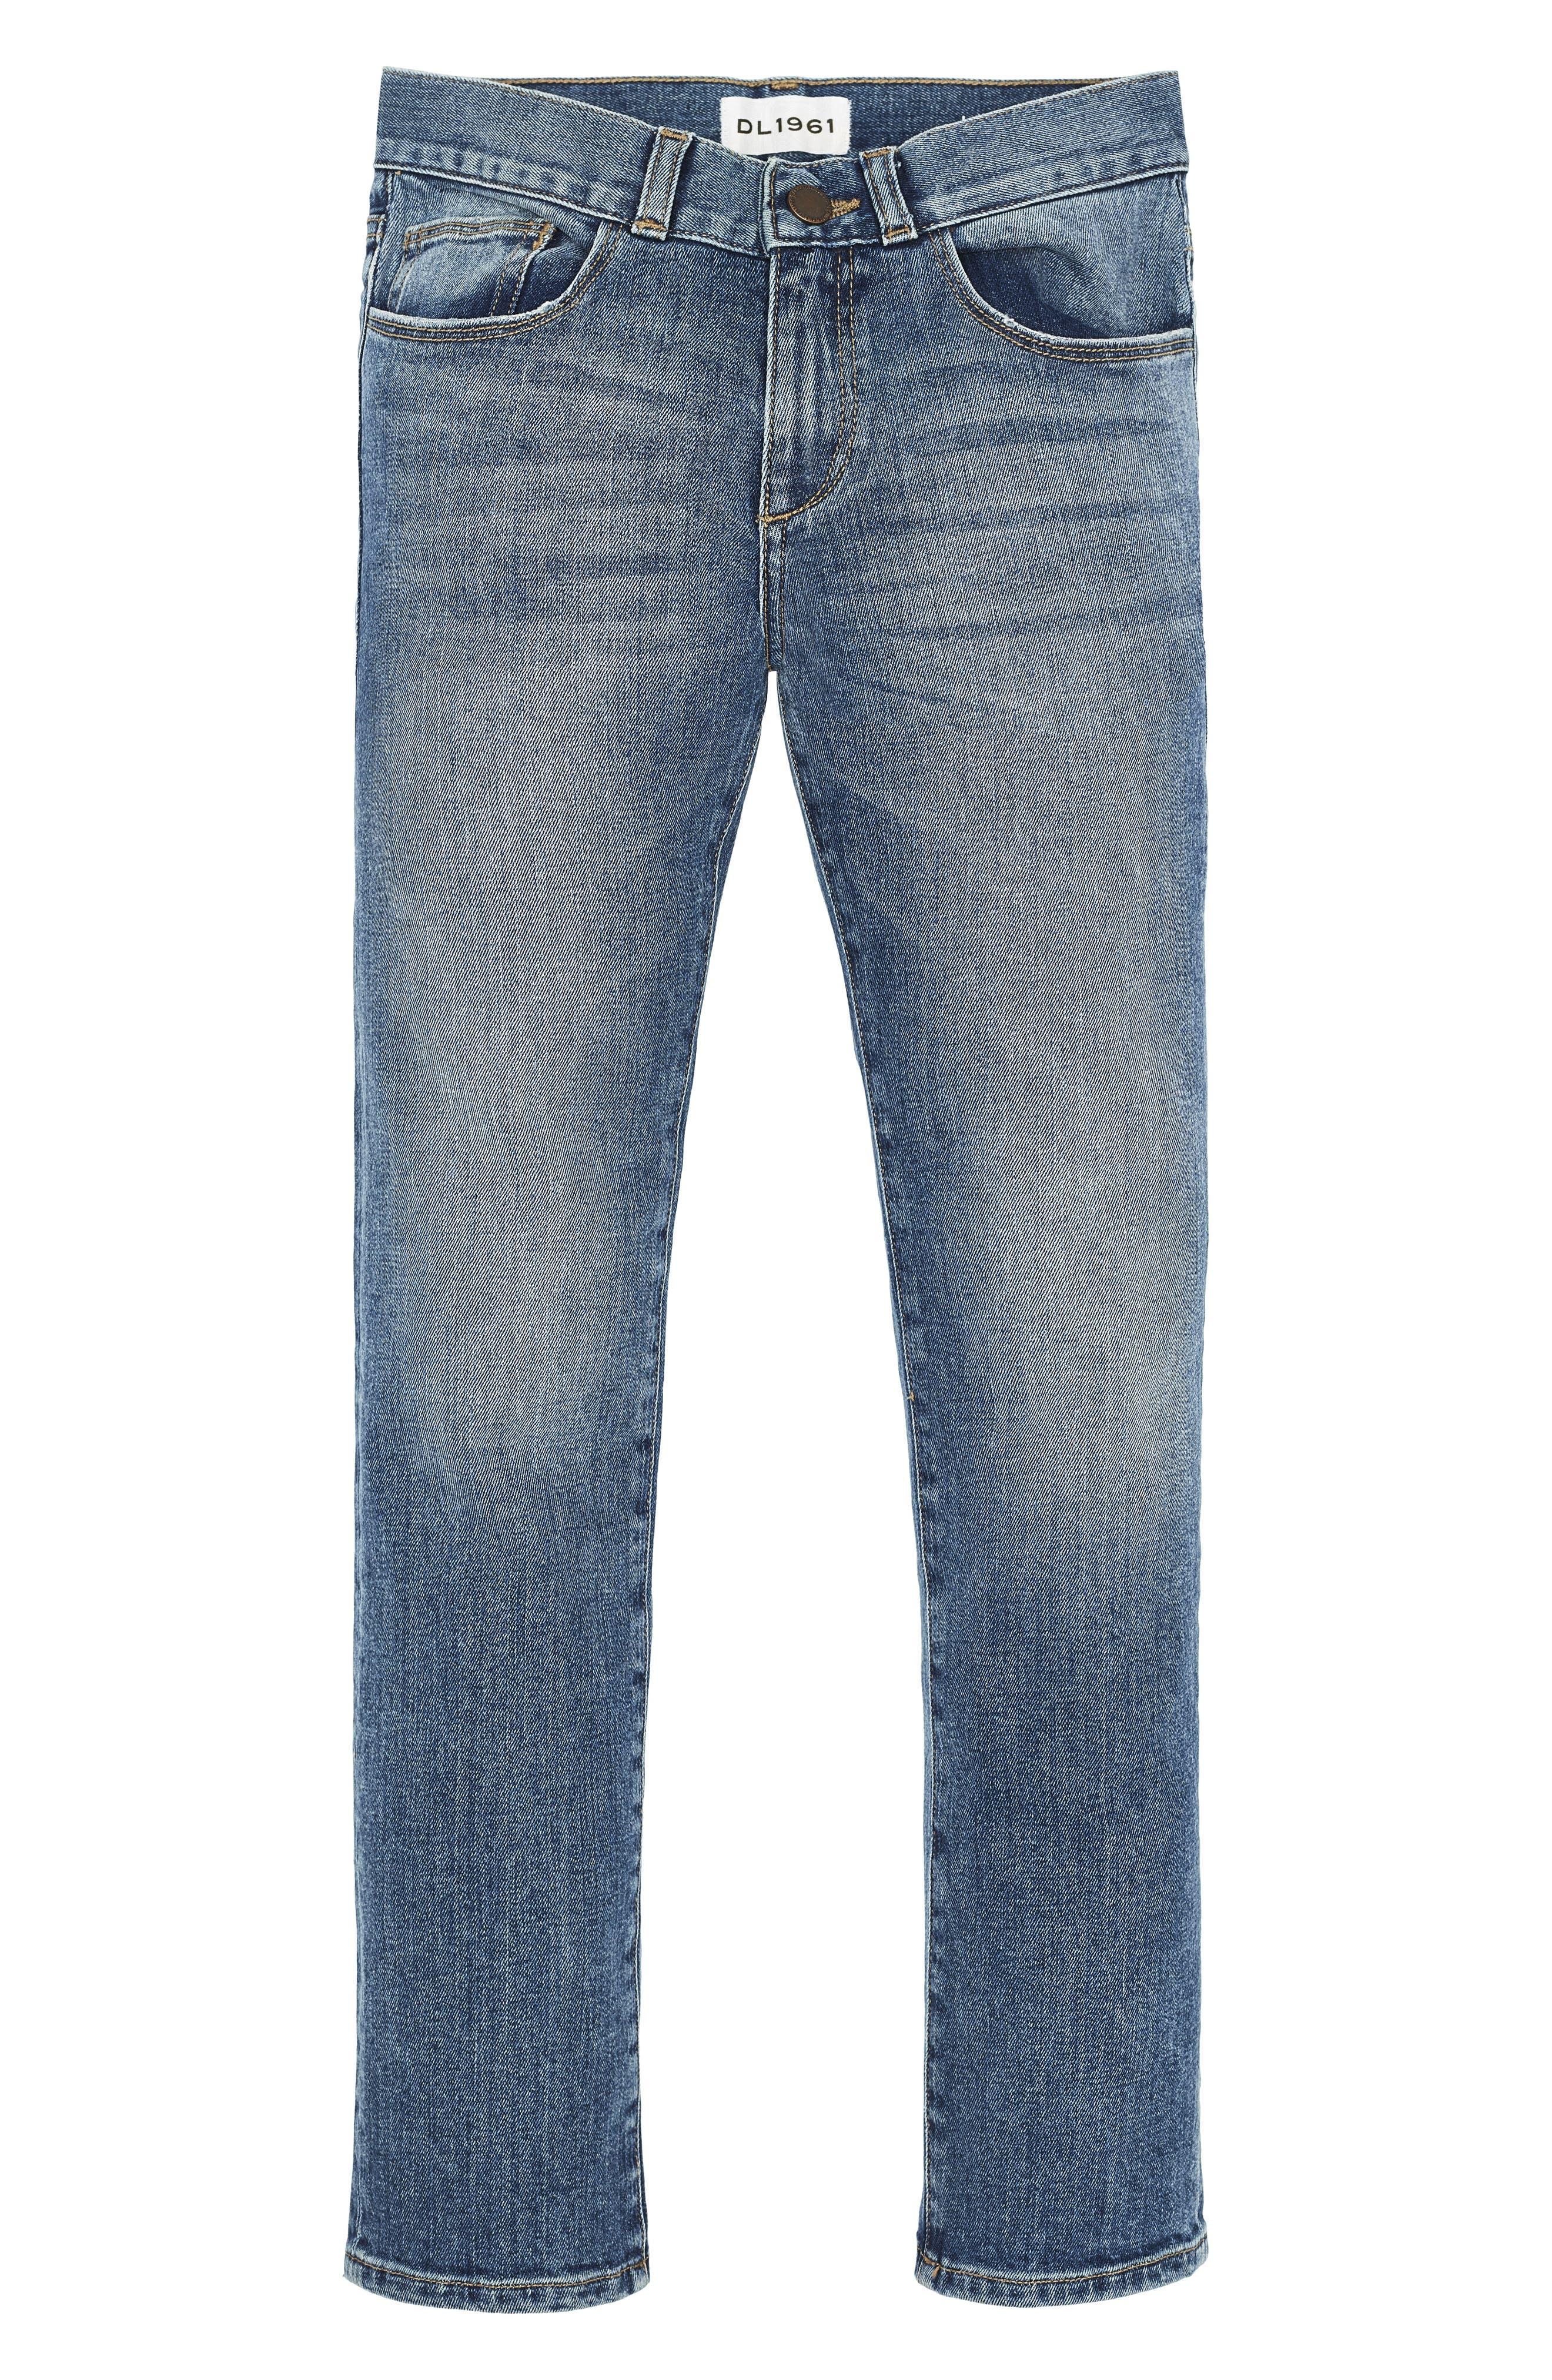 Hawke Skinny Jeans,                         Main,                         color, Aesthetic